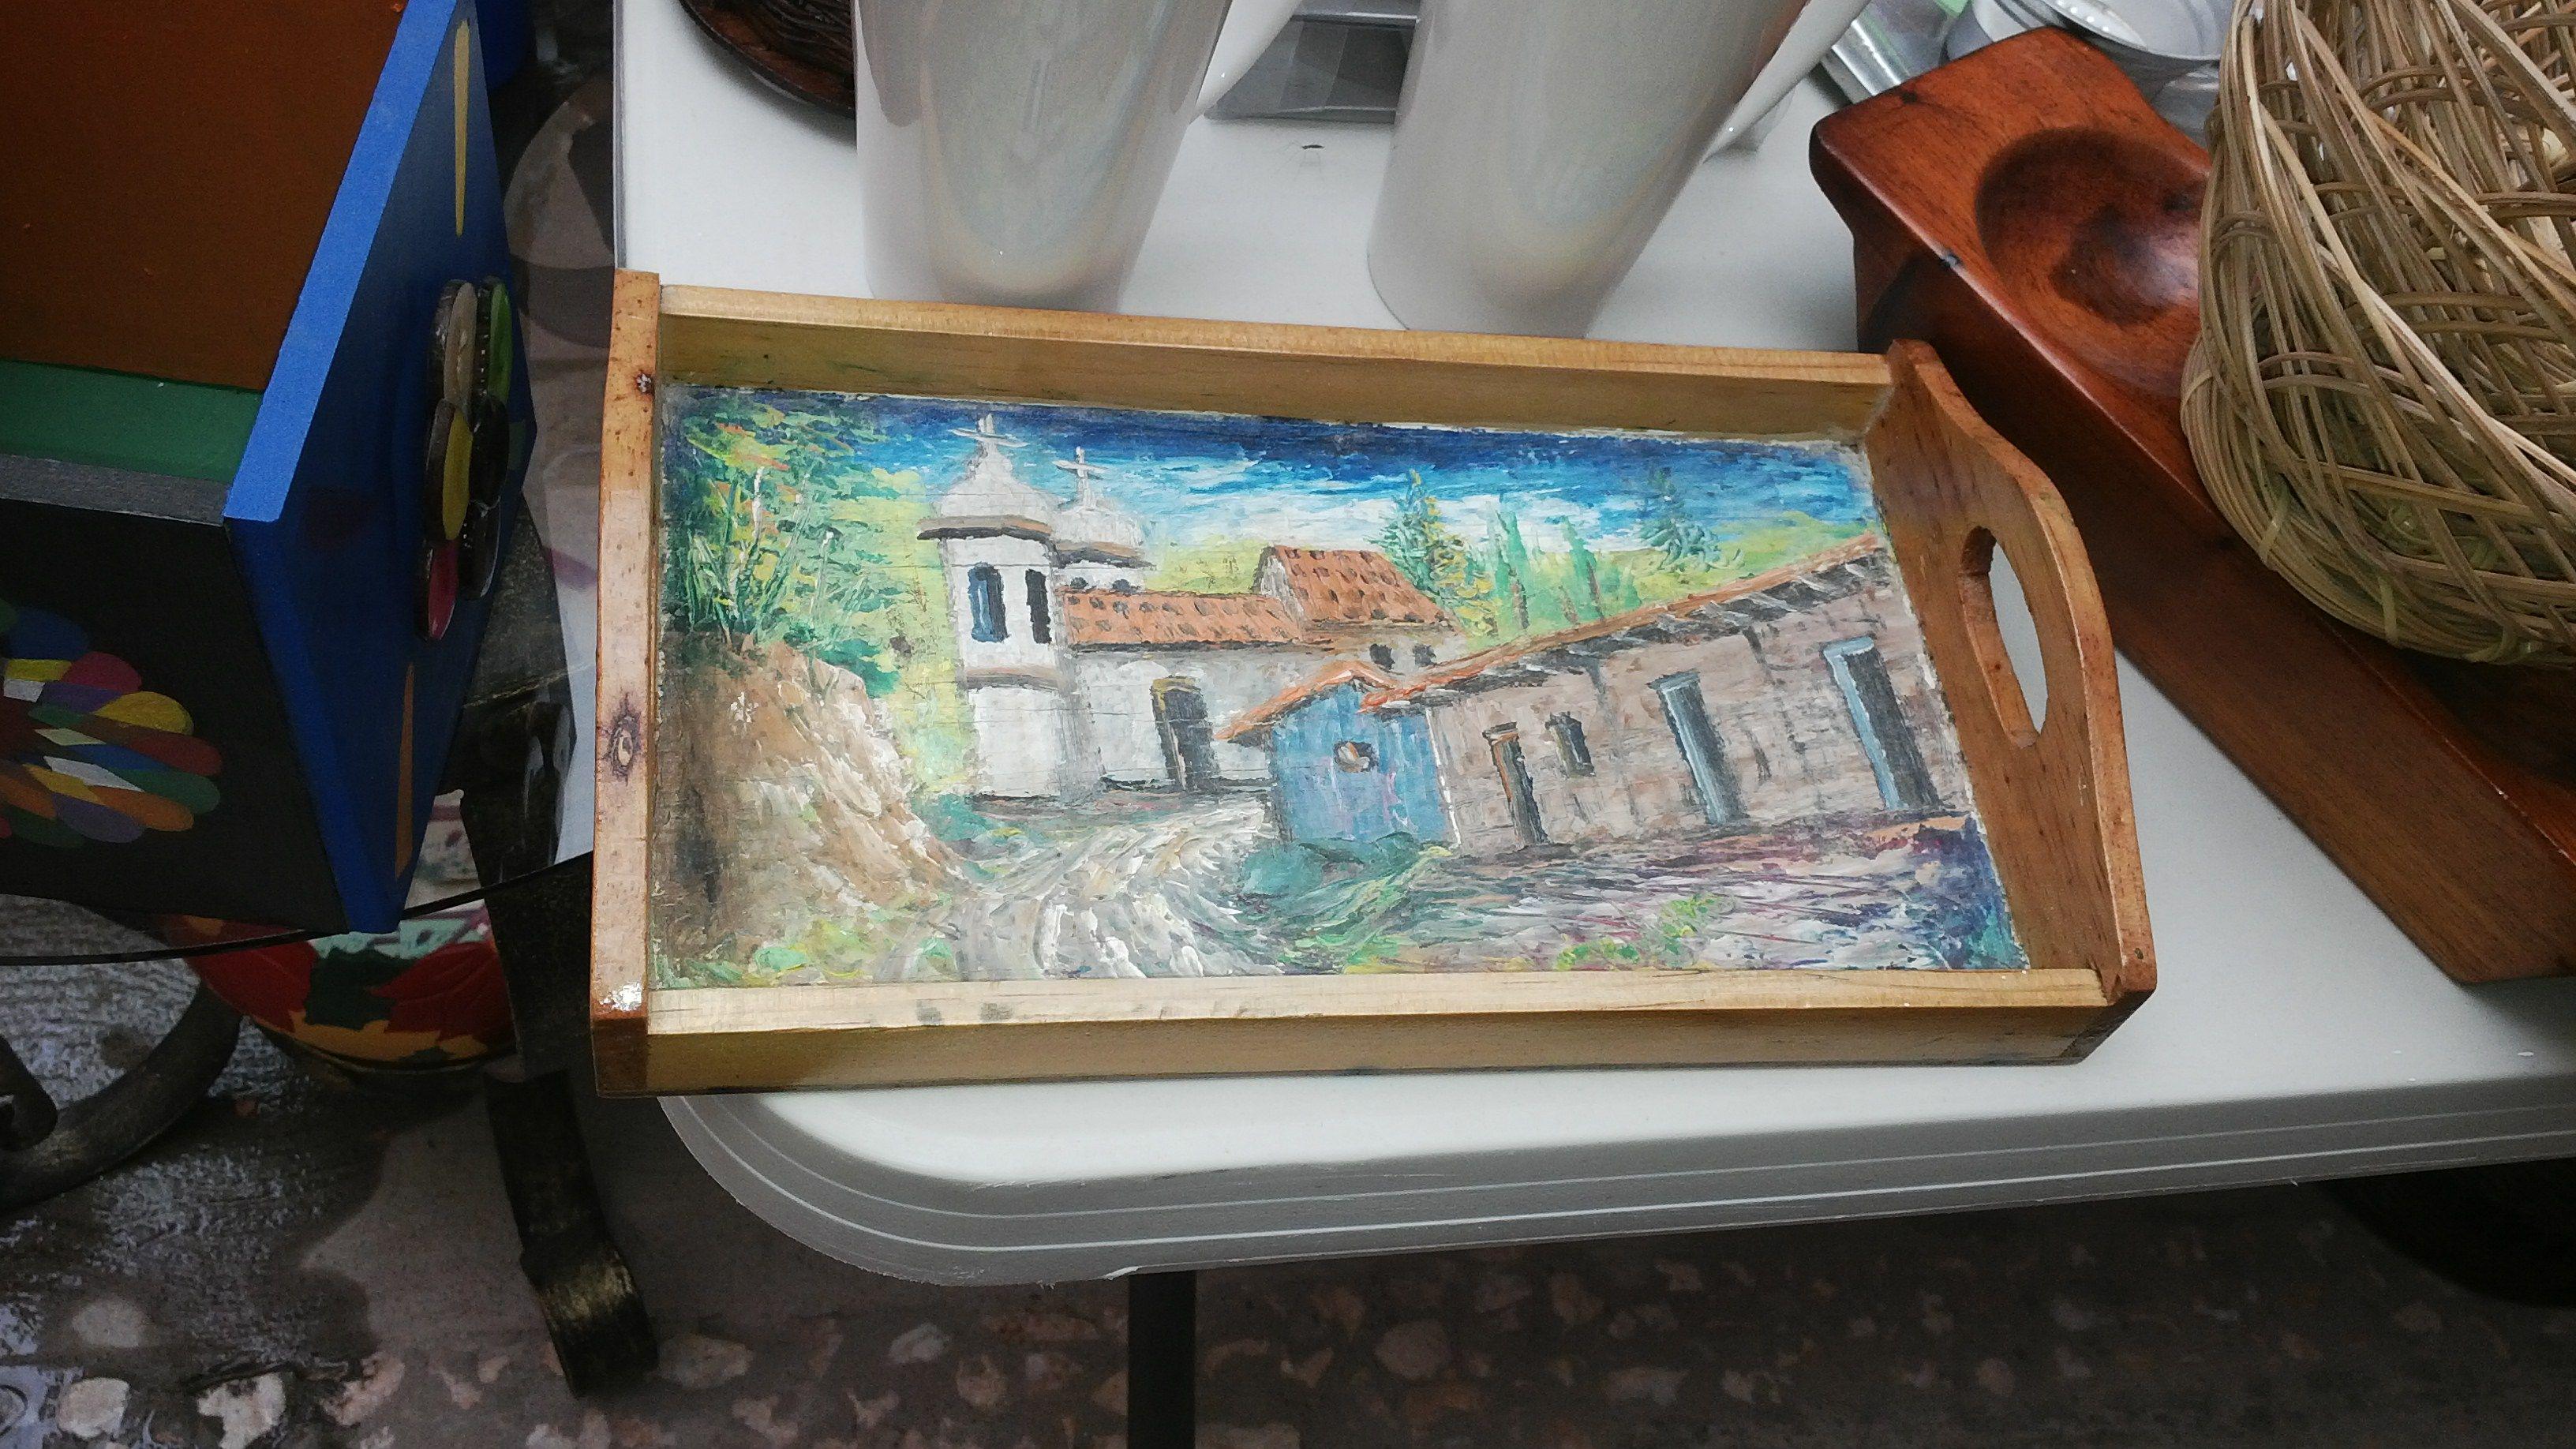 AZAFATE DE MADERA DE PINO CON PINTURA DE OLEO: artesanía hondureña ...